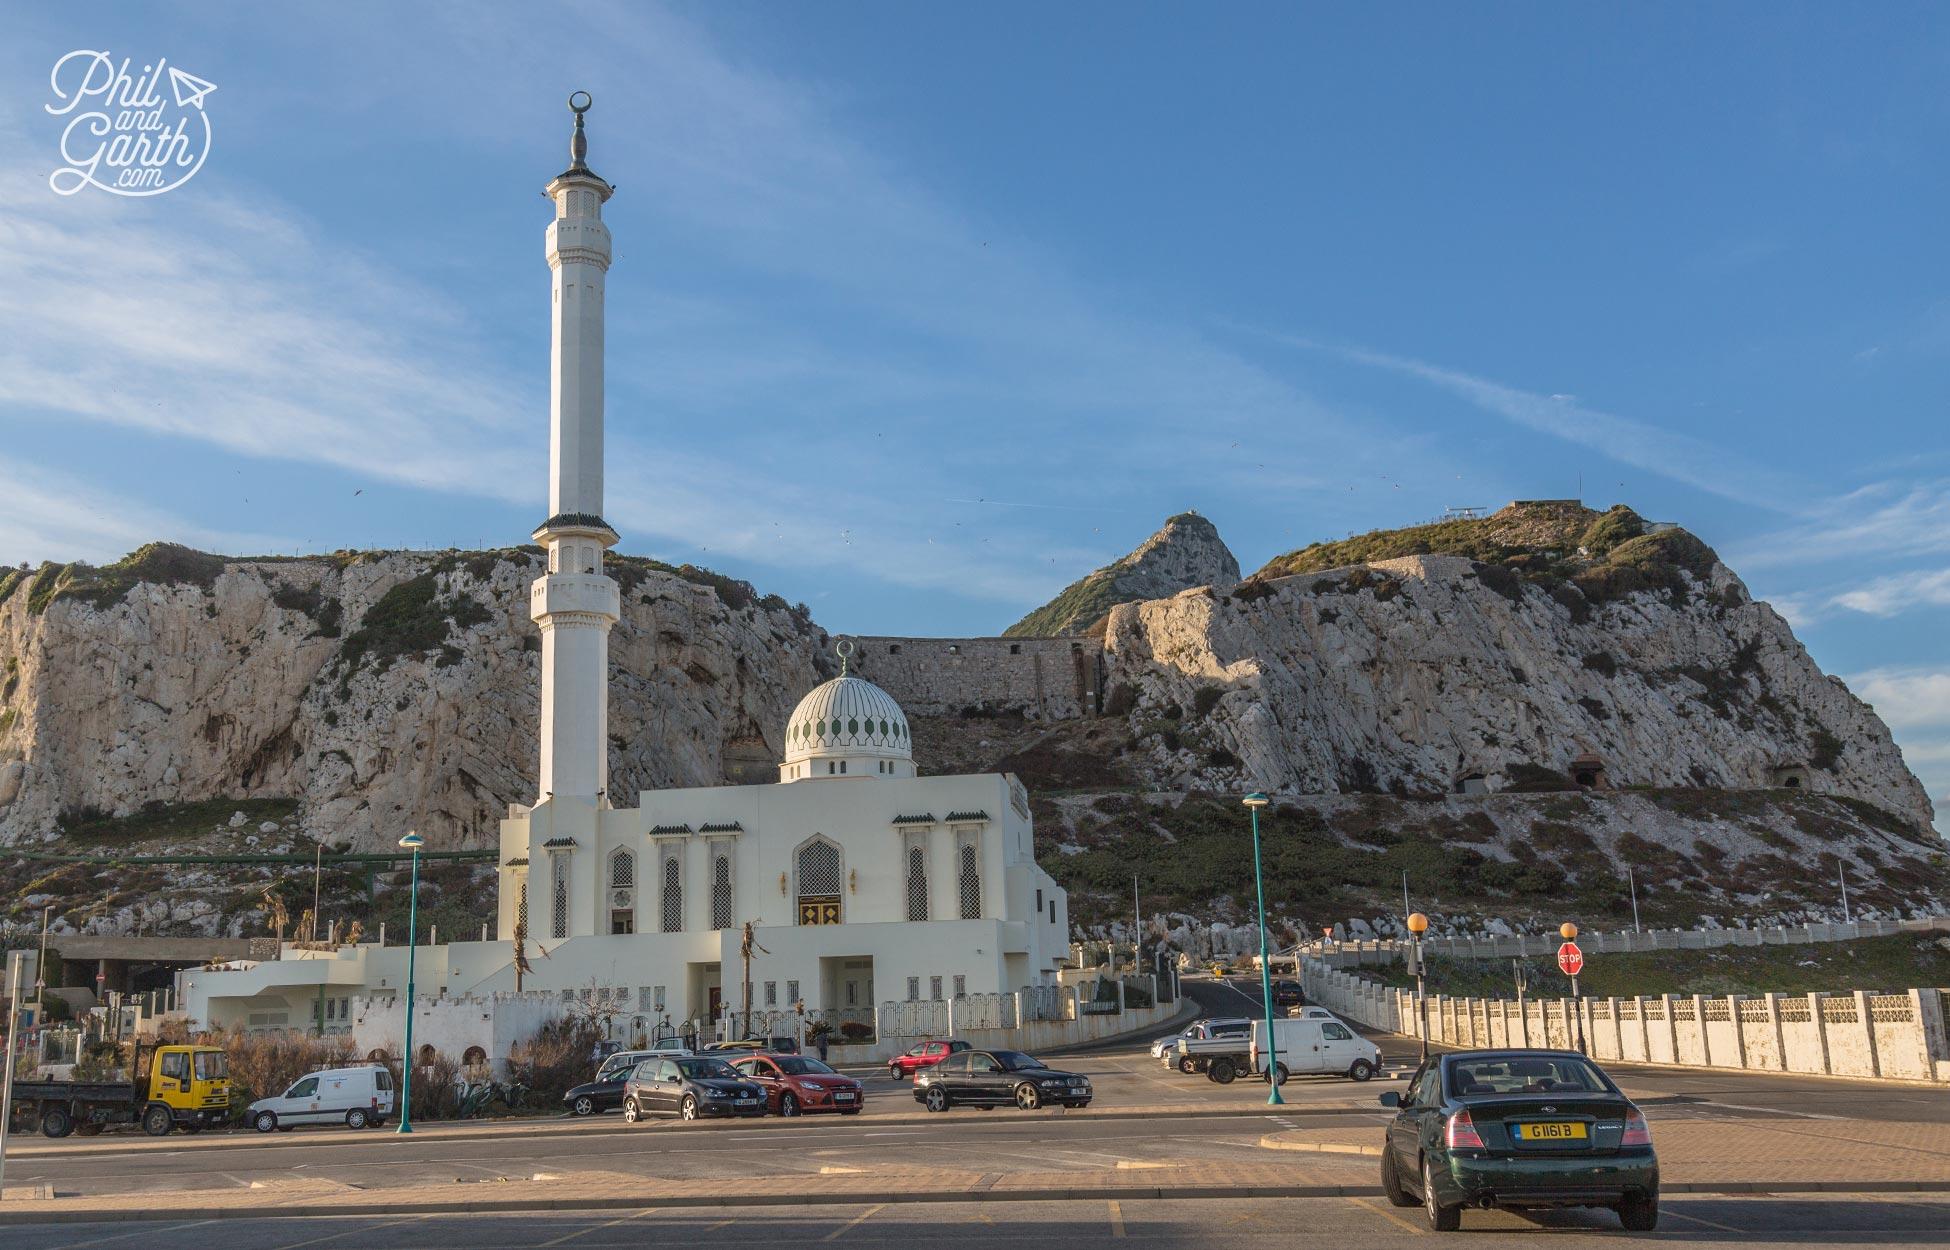 The Ibrahim-al-Ibrahim mosque at Europa Point